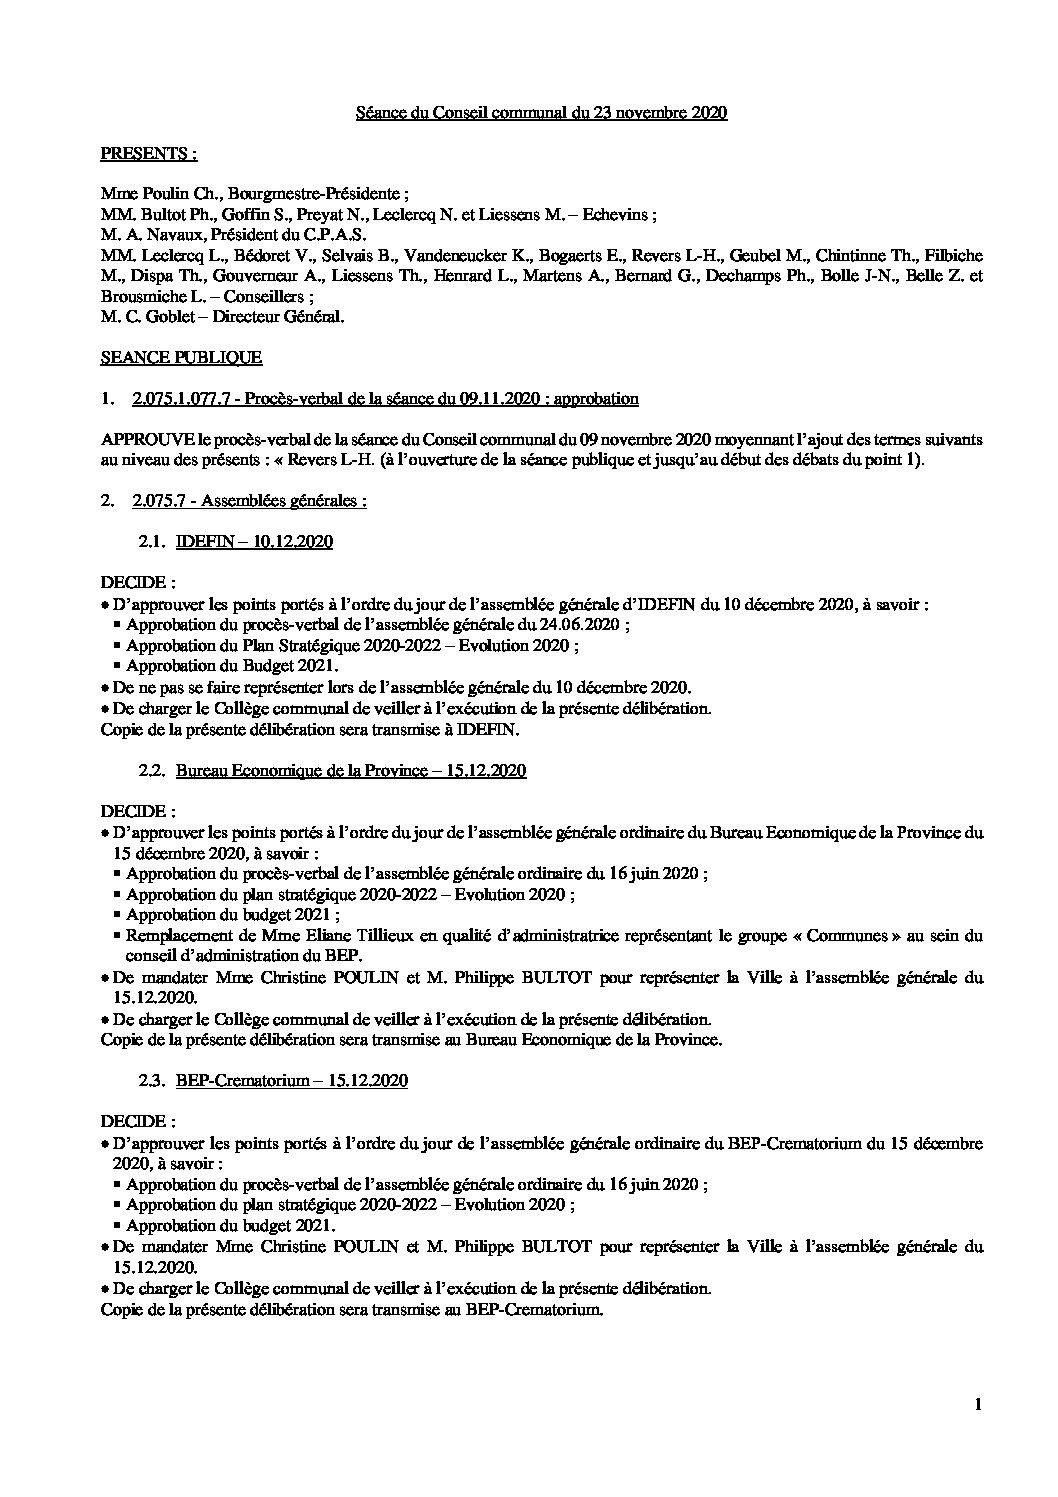 Conseil communal – 23 novembre 2020